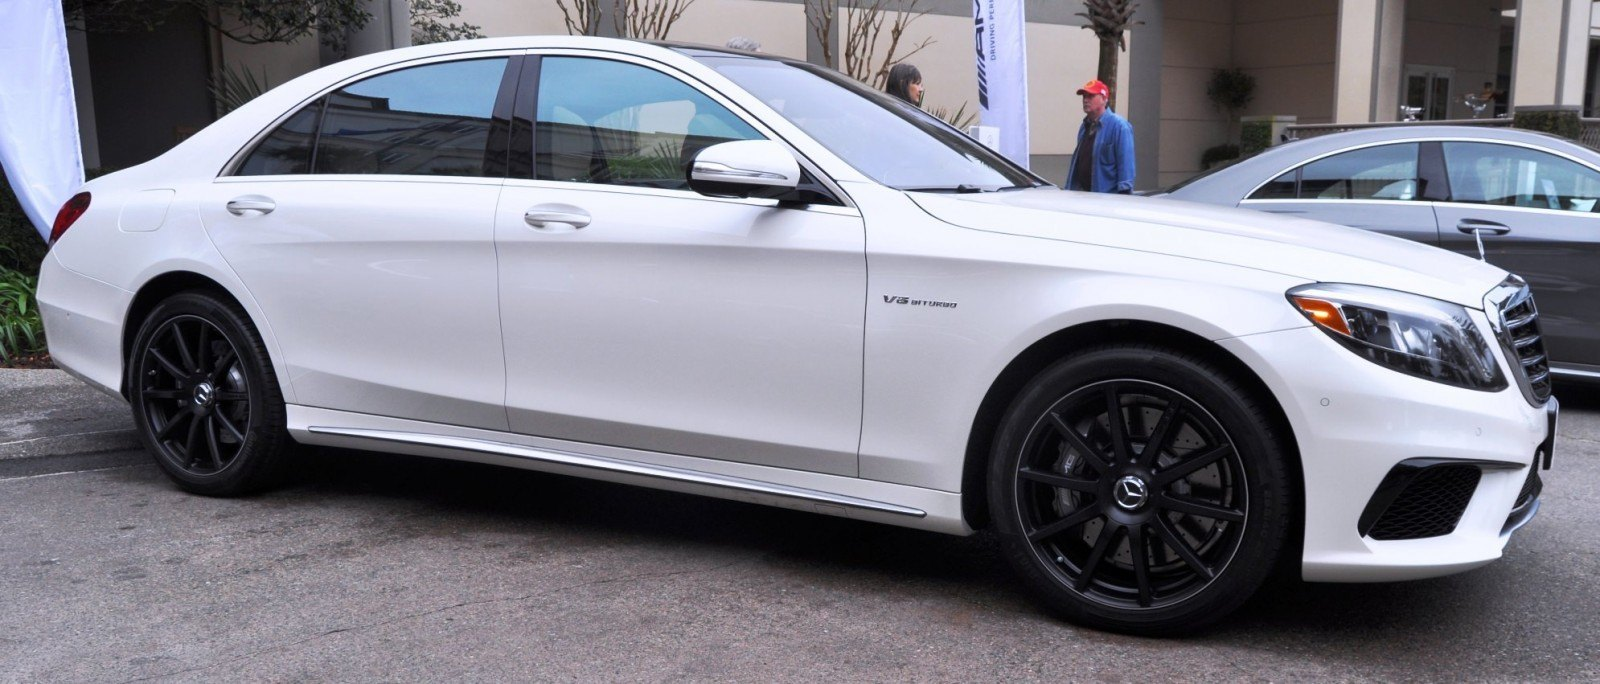 2014 mercedes benz s63 amg colors for Mercedes benz color